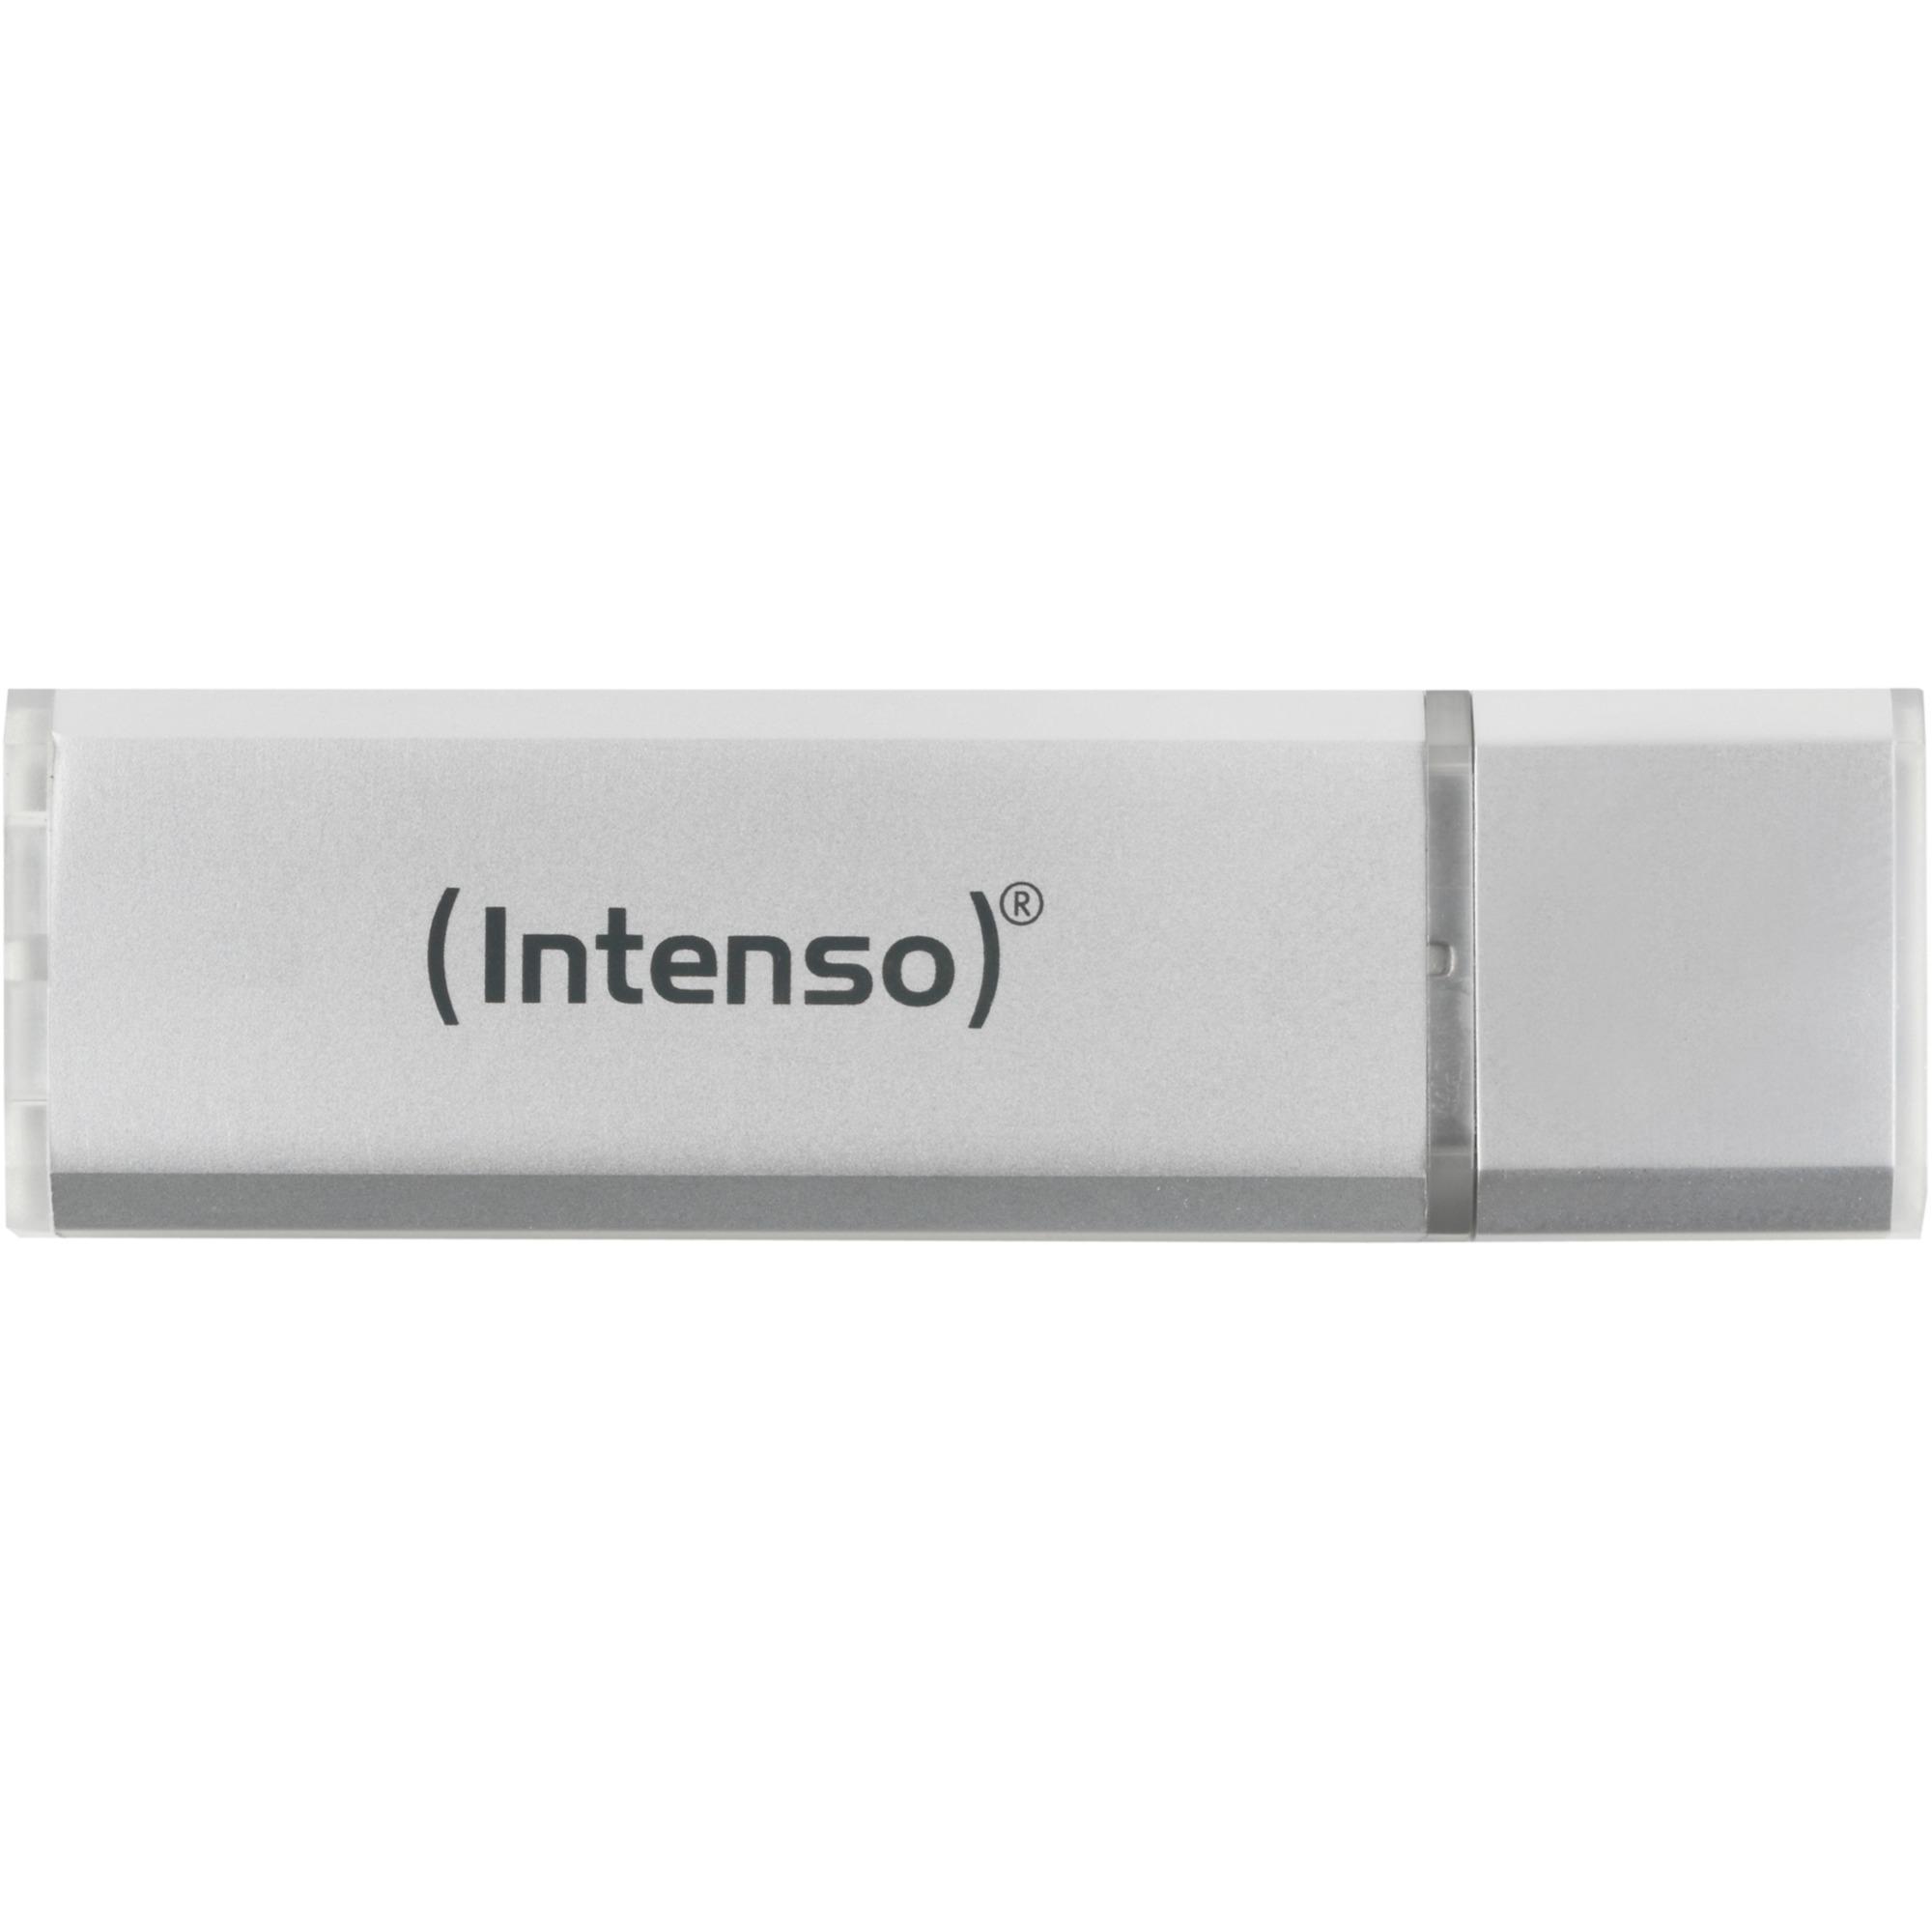 16GB Ultra USB3.0 unidad flash USB 3.0 (3.1 Gen 1) Conector USB Tipo A Plata, Lápiz USB